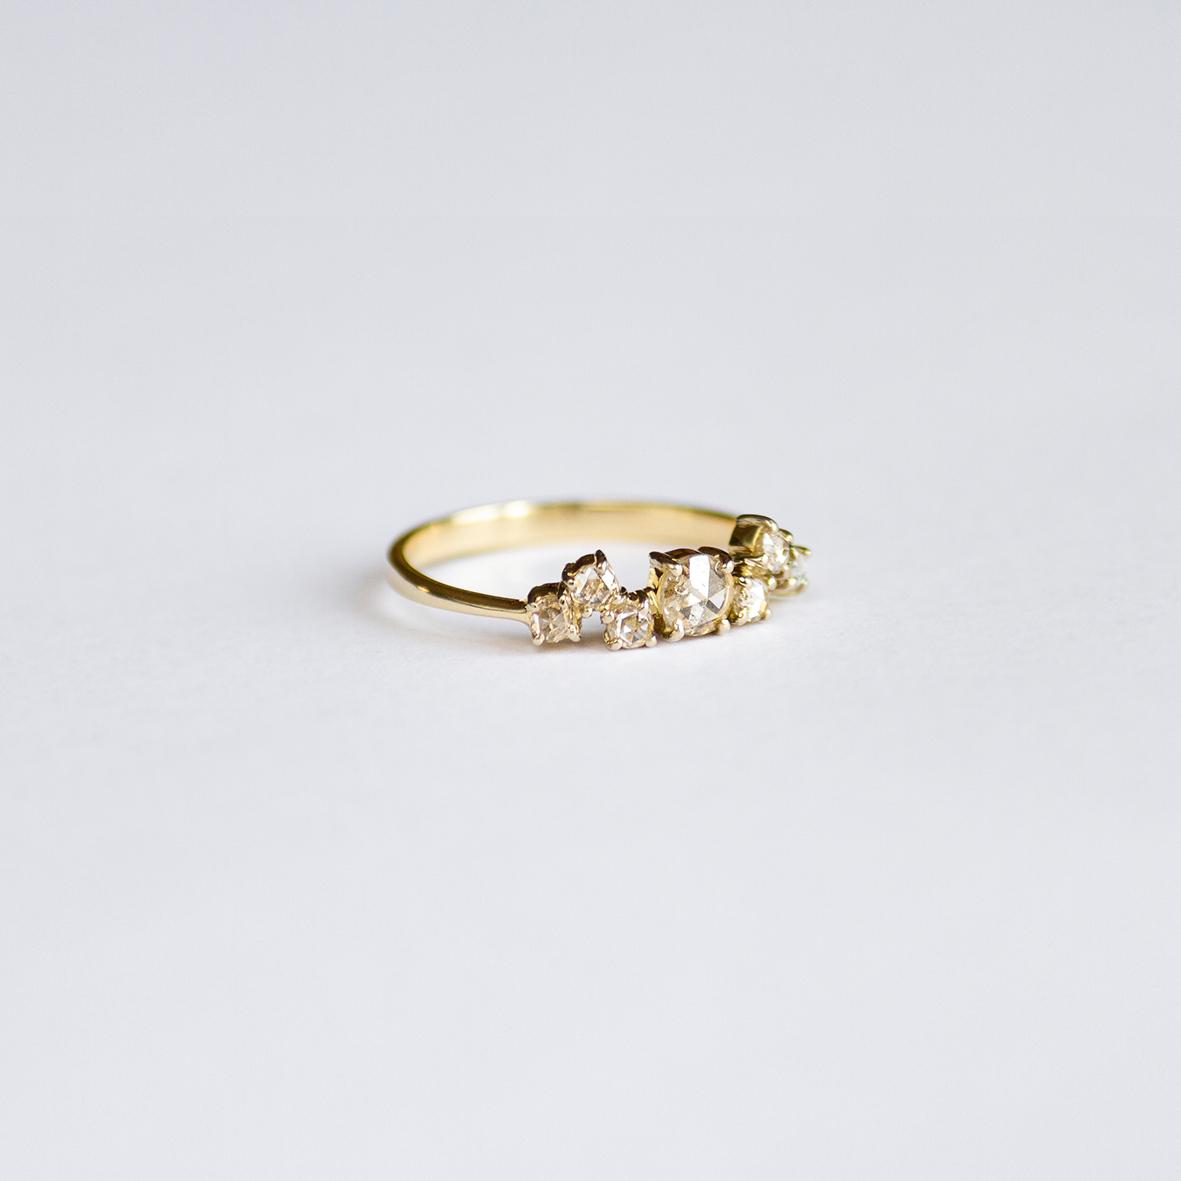 3. OONA_engagement_principal_wave diamonds ring